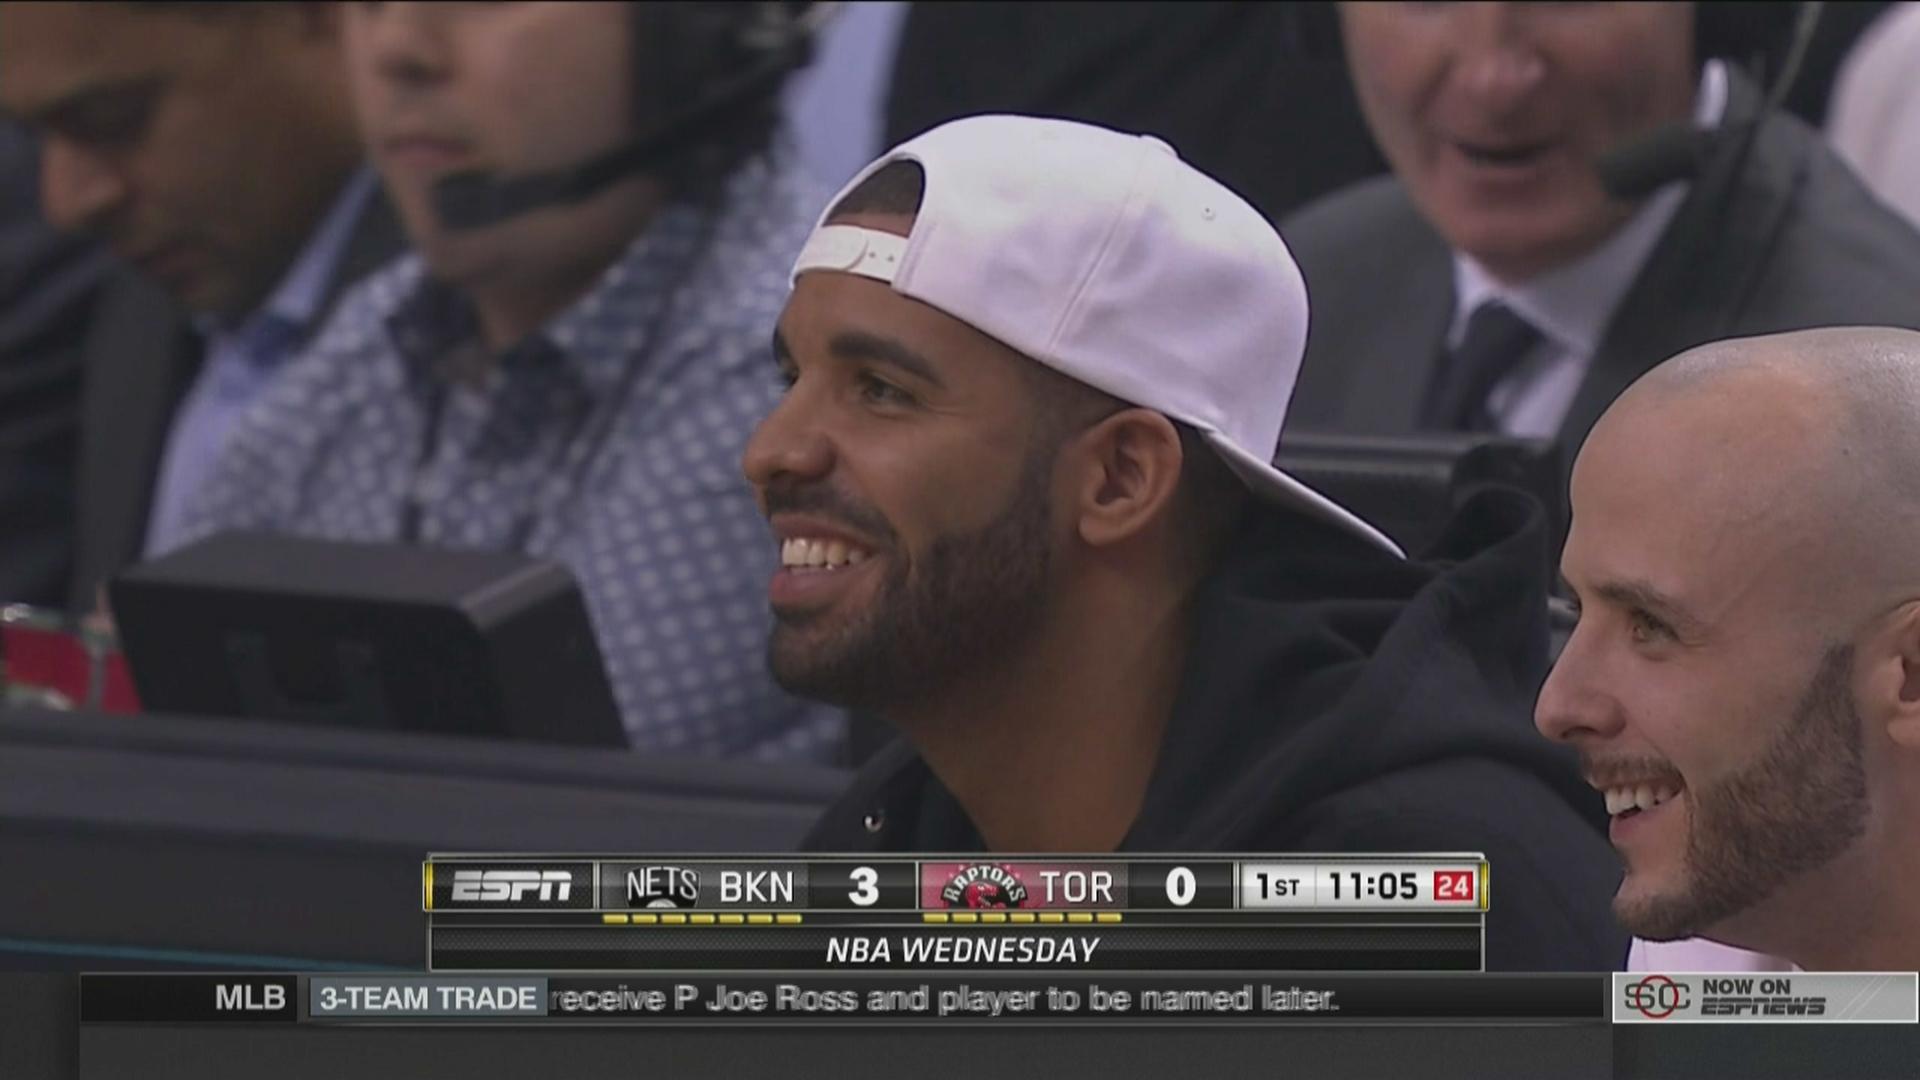 Raptors celebrate 'Drake Night' 2 against Nets